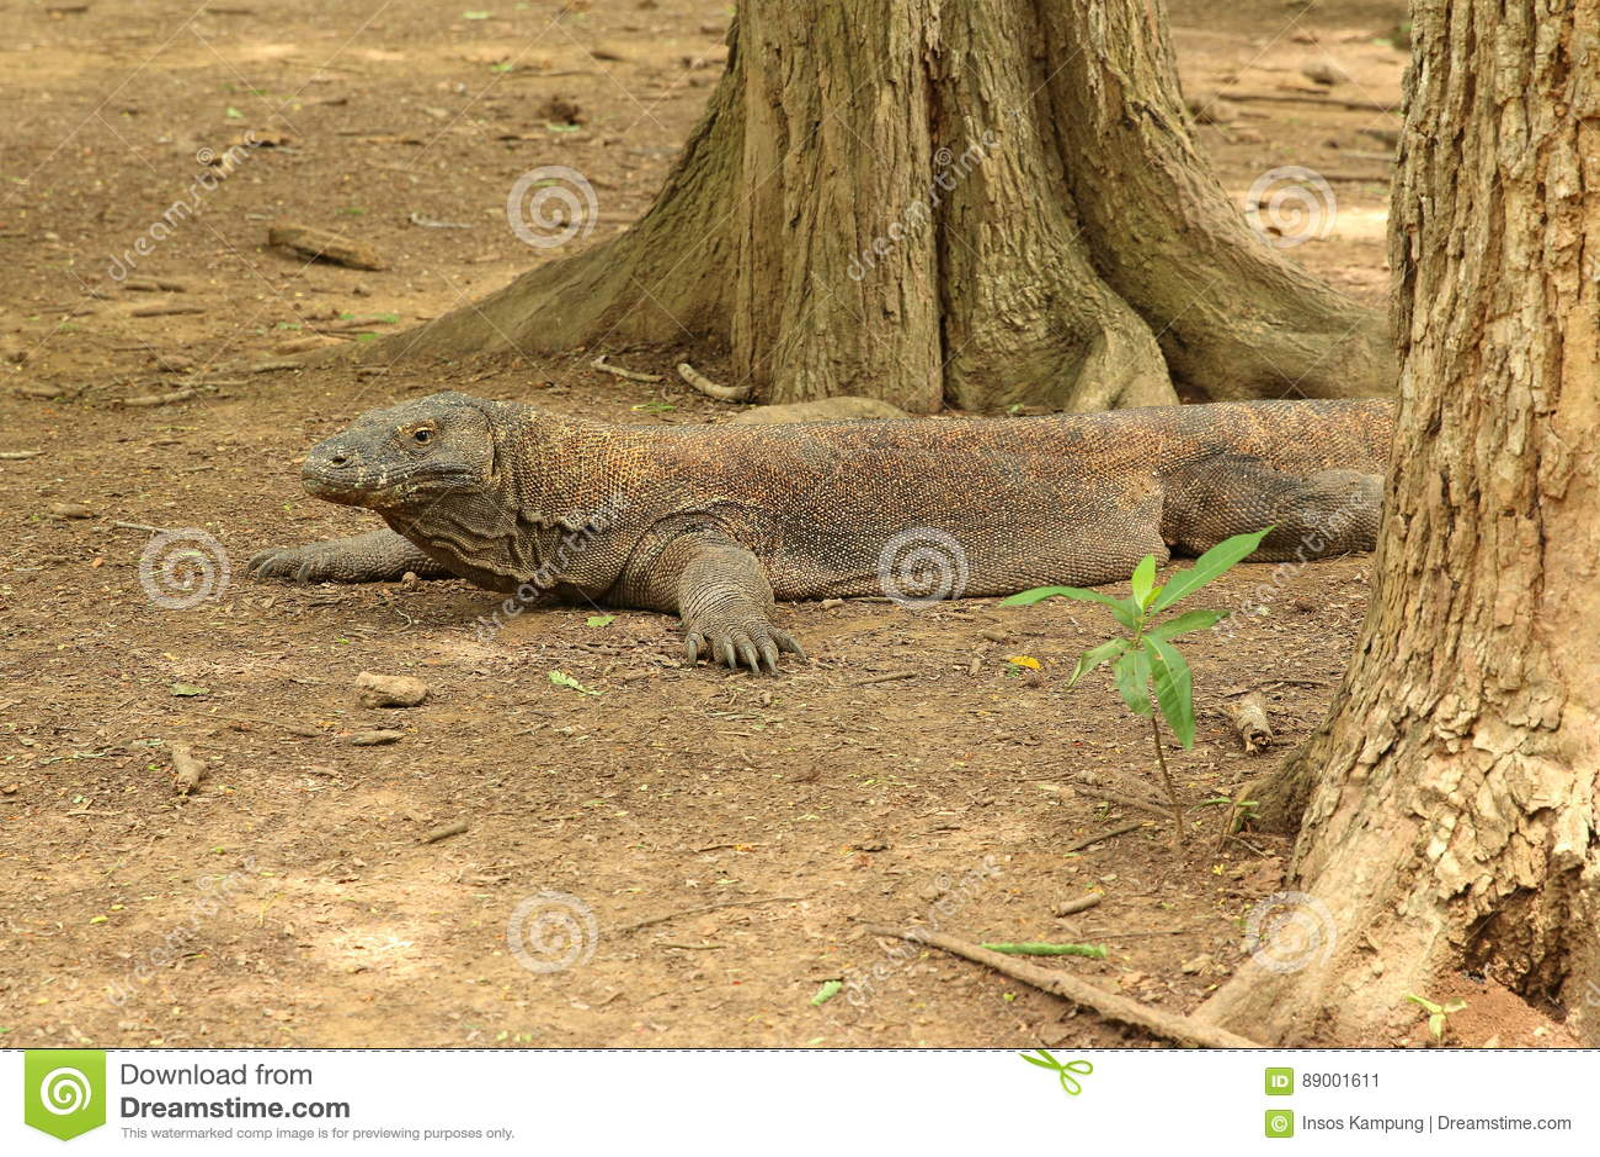 Komodo Dragon, Komodo Island